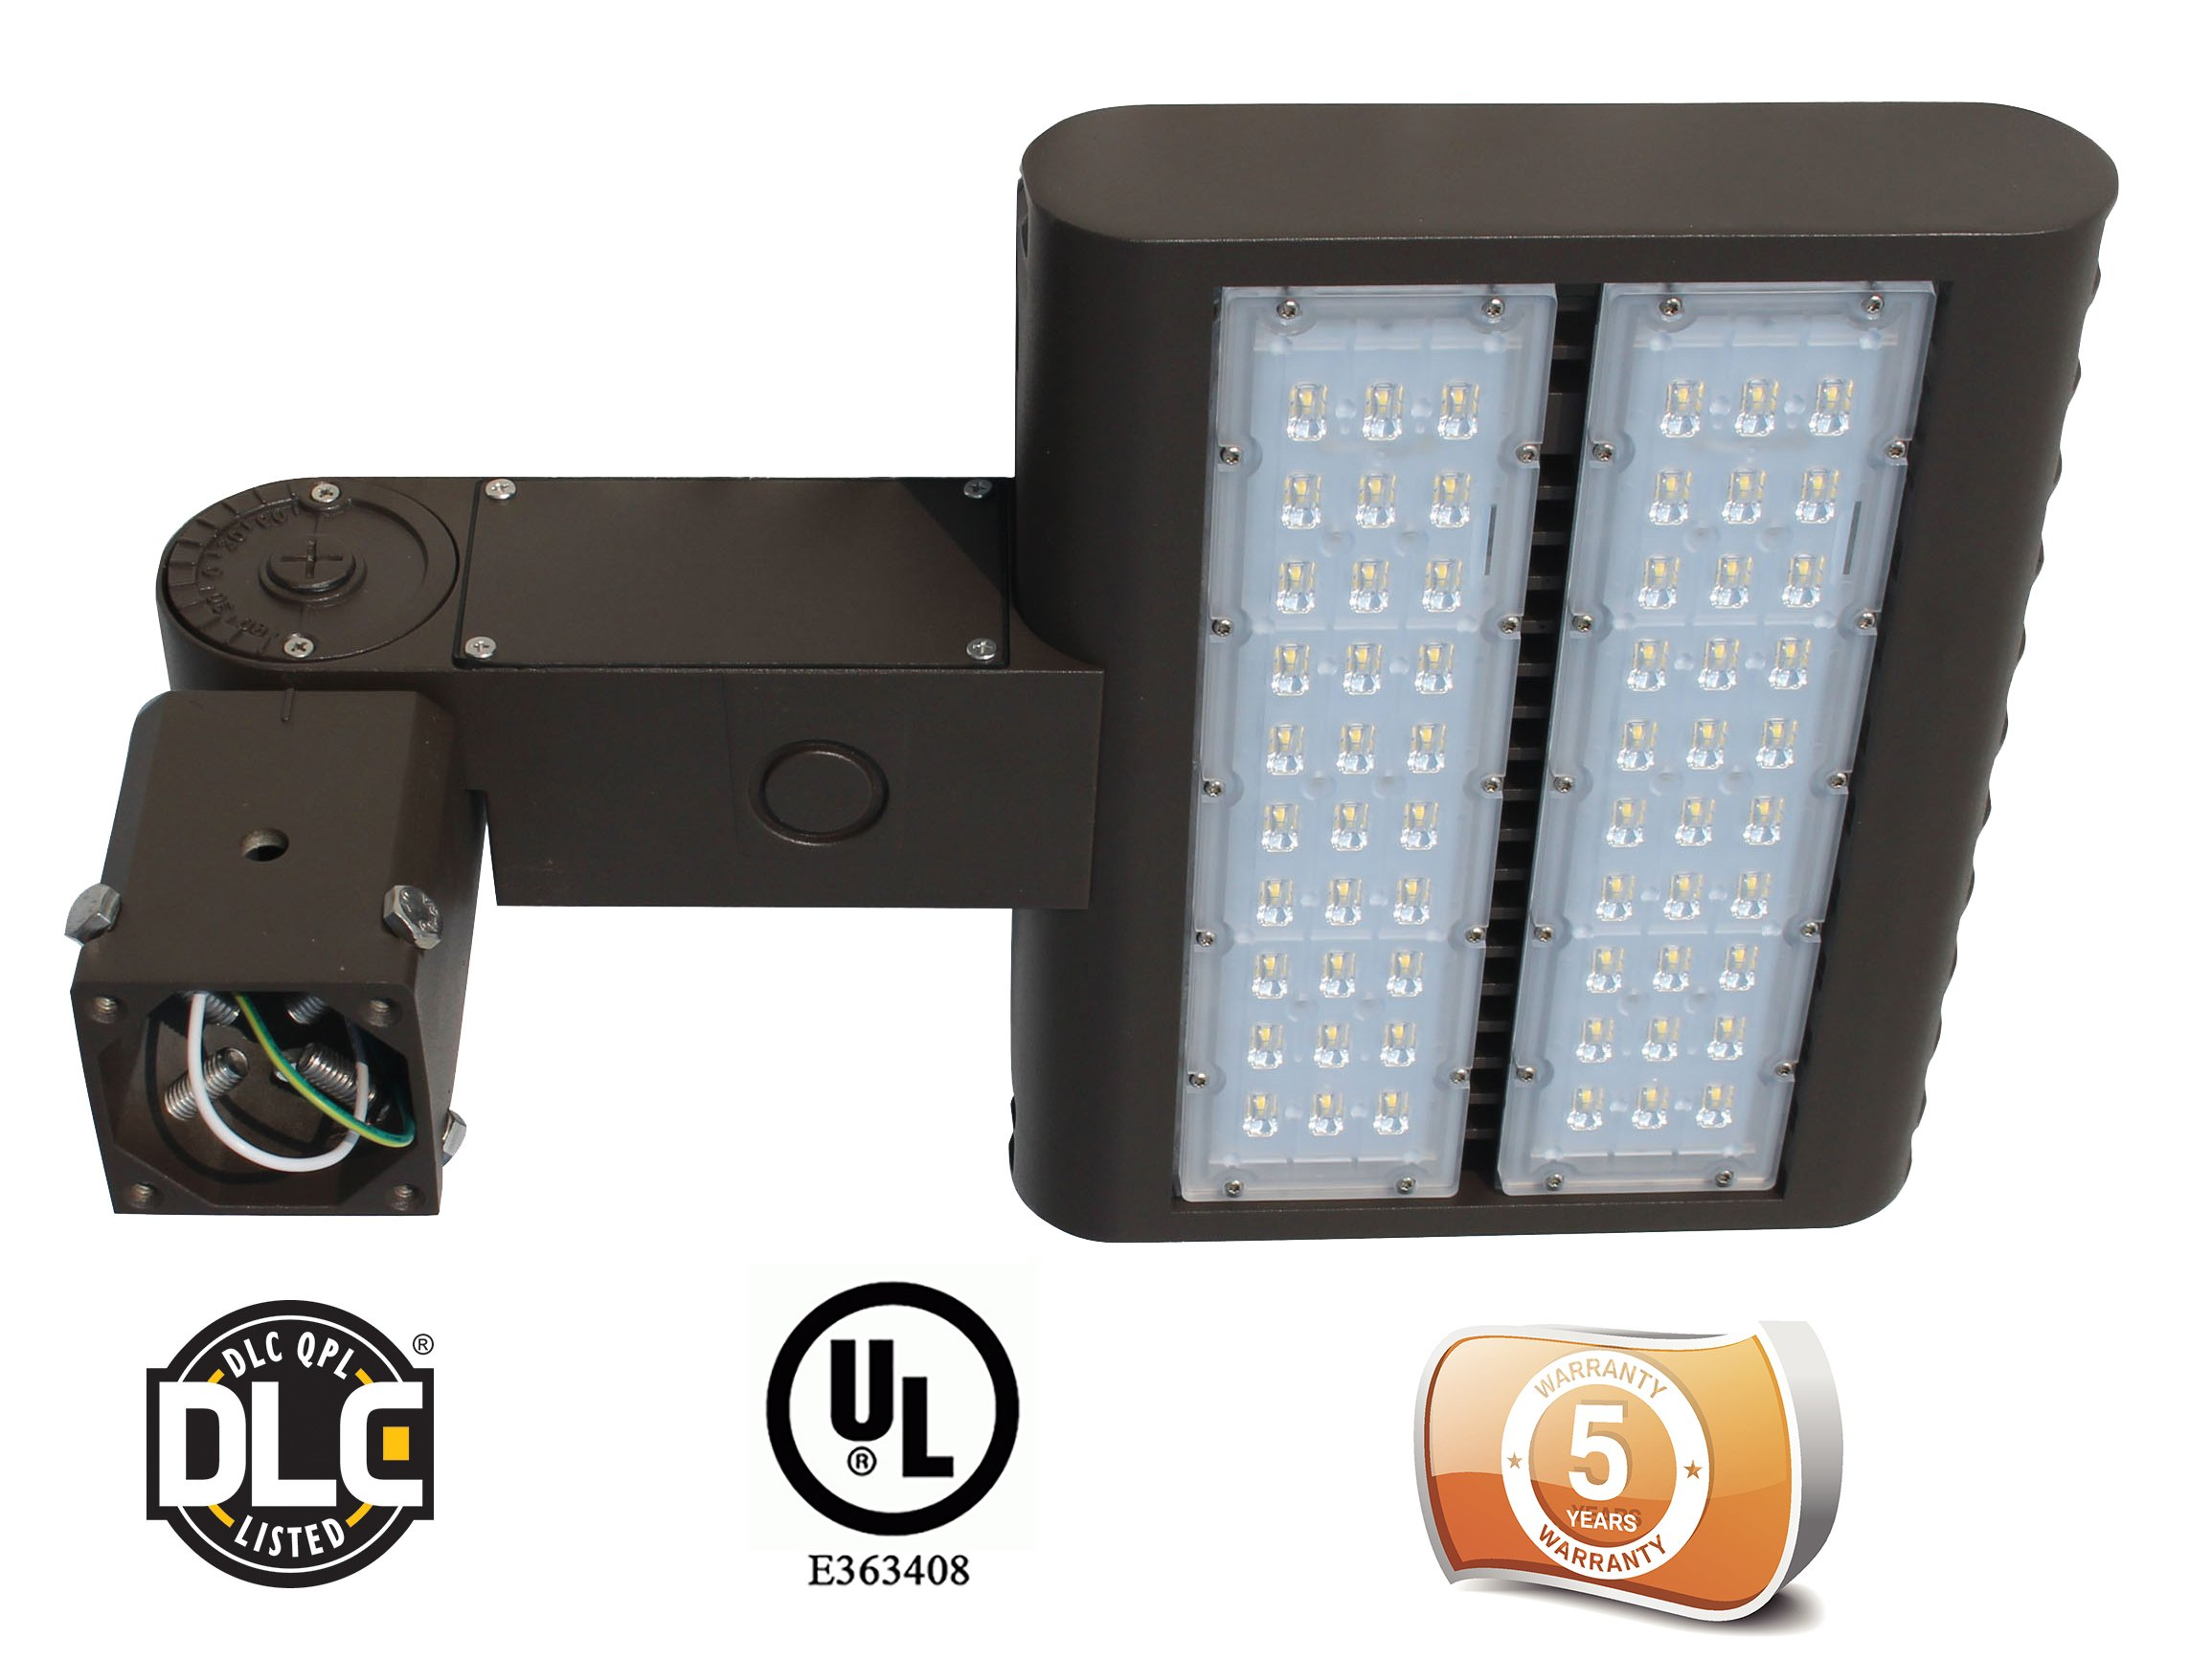 DLC Listed LEDrock Electra Series 150 Watt LED Area Light, 4000K Neutral White, 120V-277V, Comparable to 400W MH, 15,131 Lumens, Slipfitter Mount Area Light, UL, Warranty Based in Denver, CO, USA by LEDrock